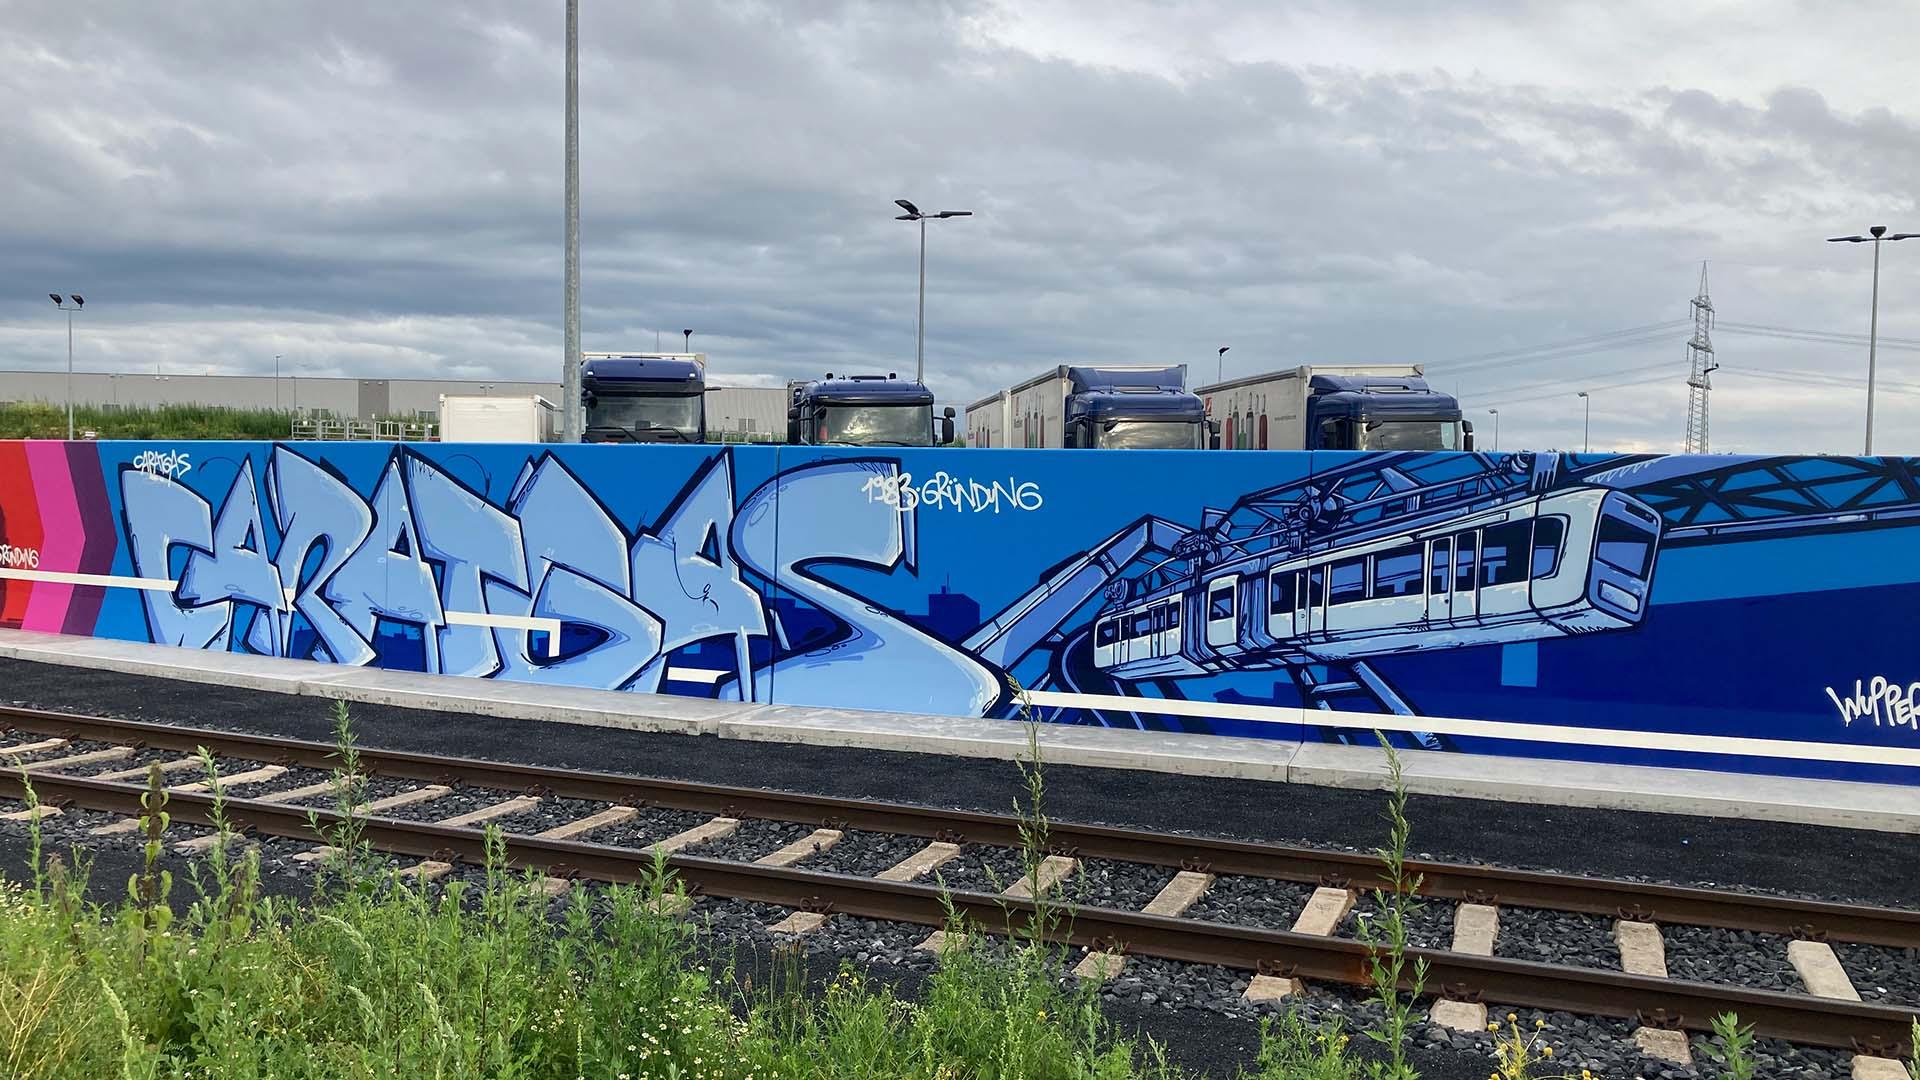 Schwebebahn, Graffiti, Caratgas, Unternehmen, Firma, Krefeld, Gaswerk